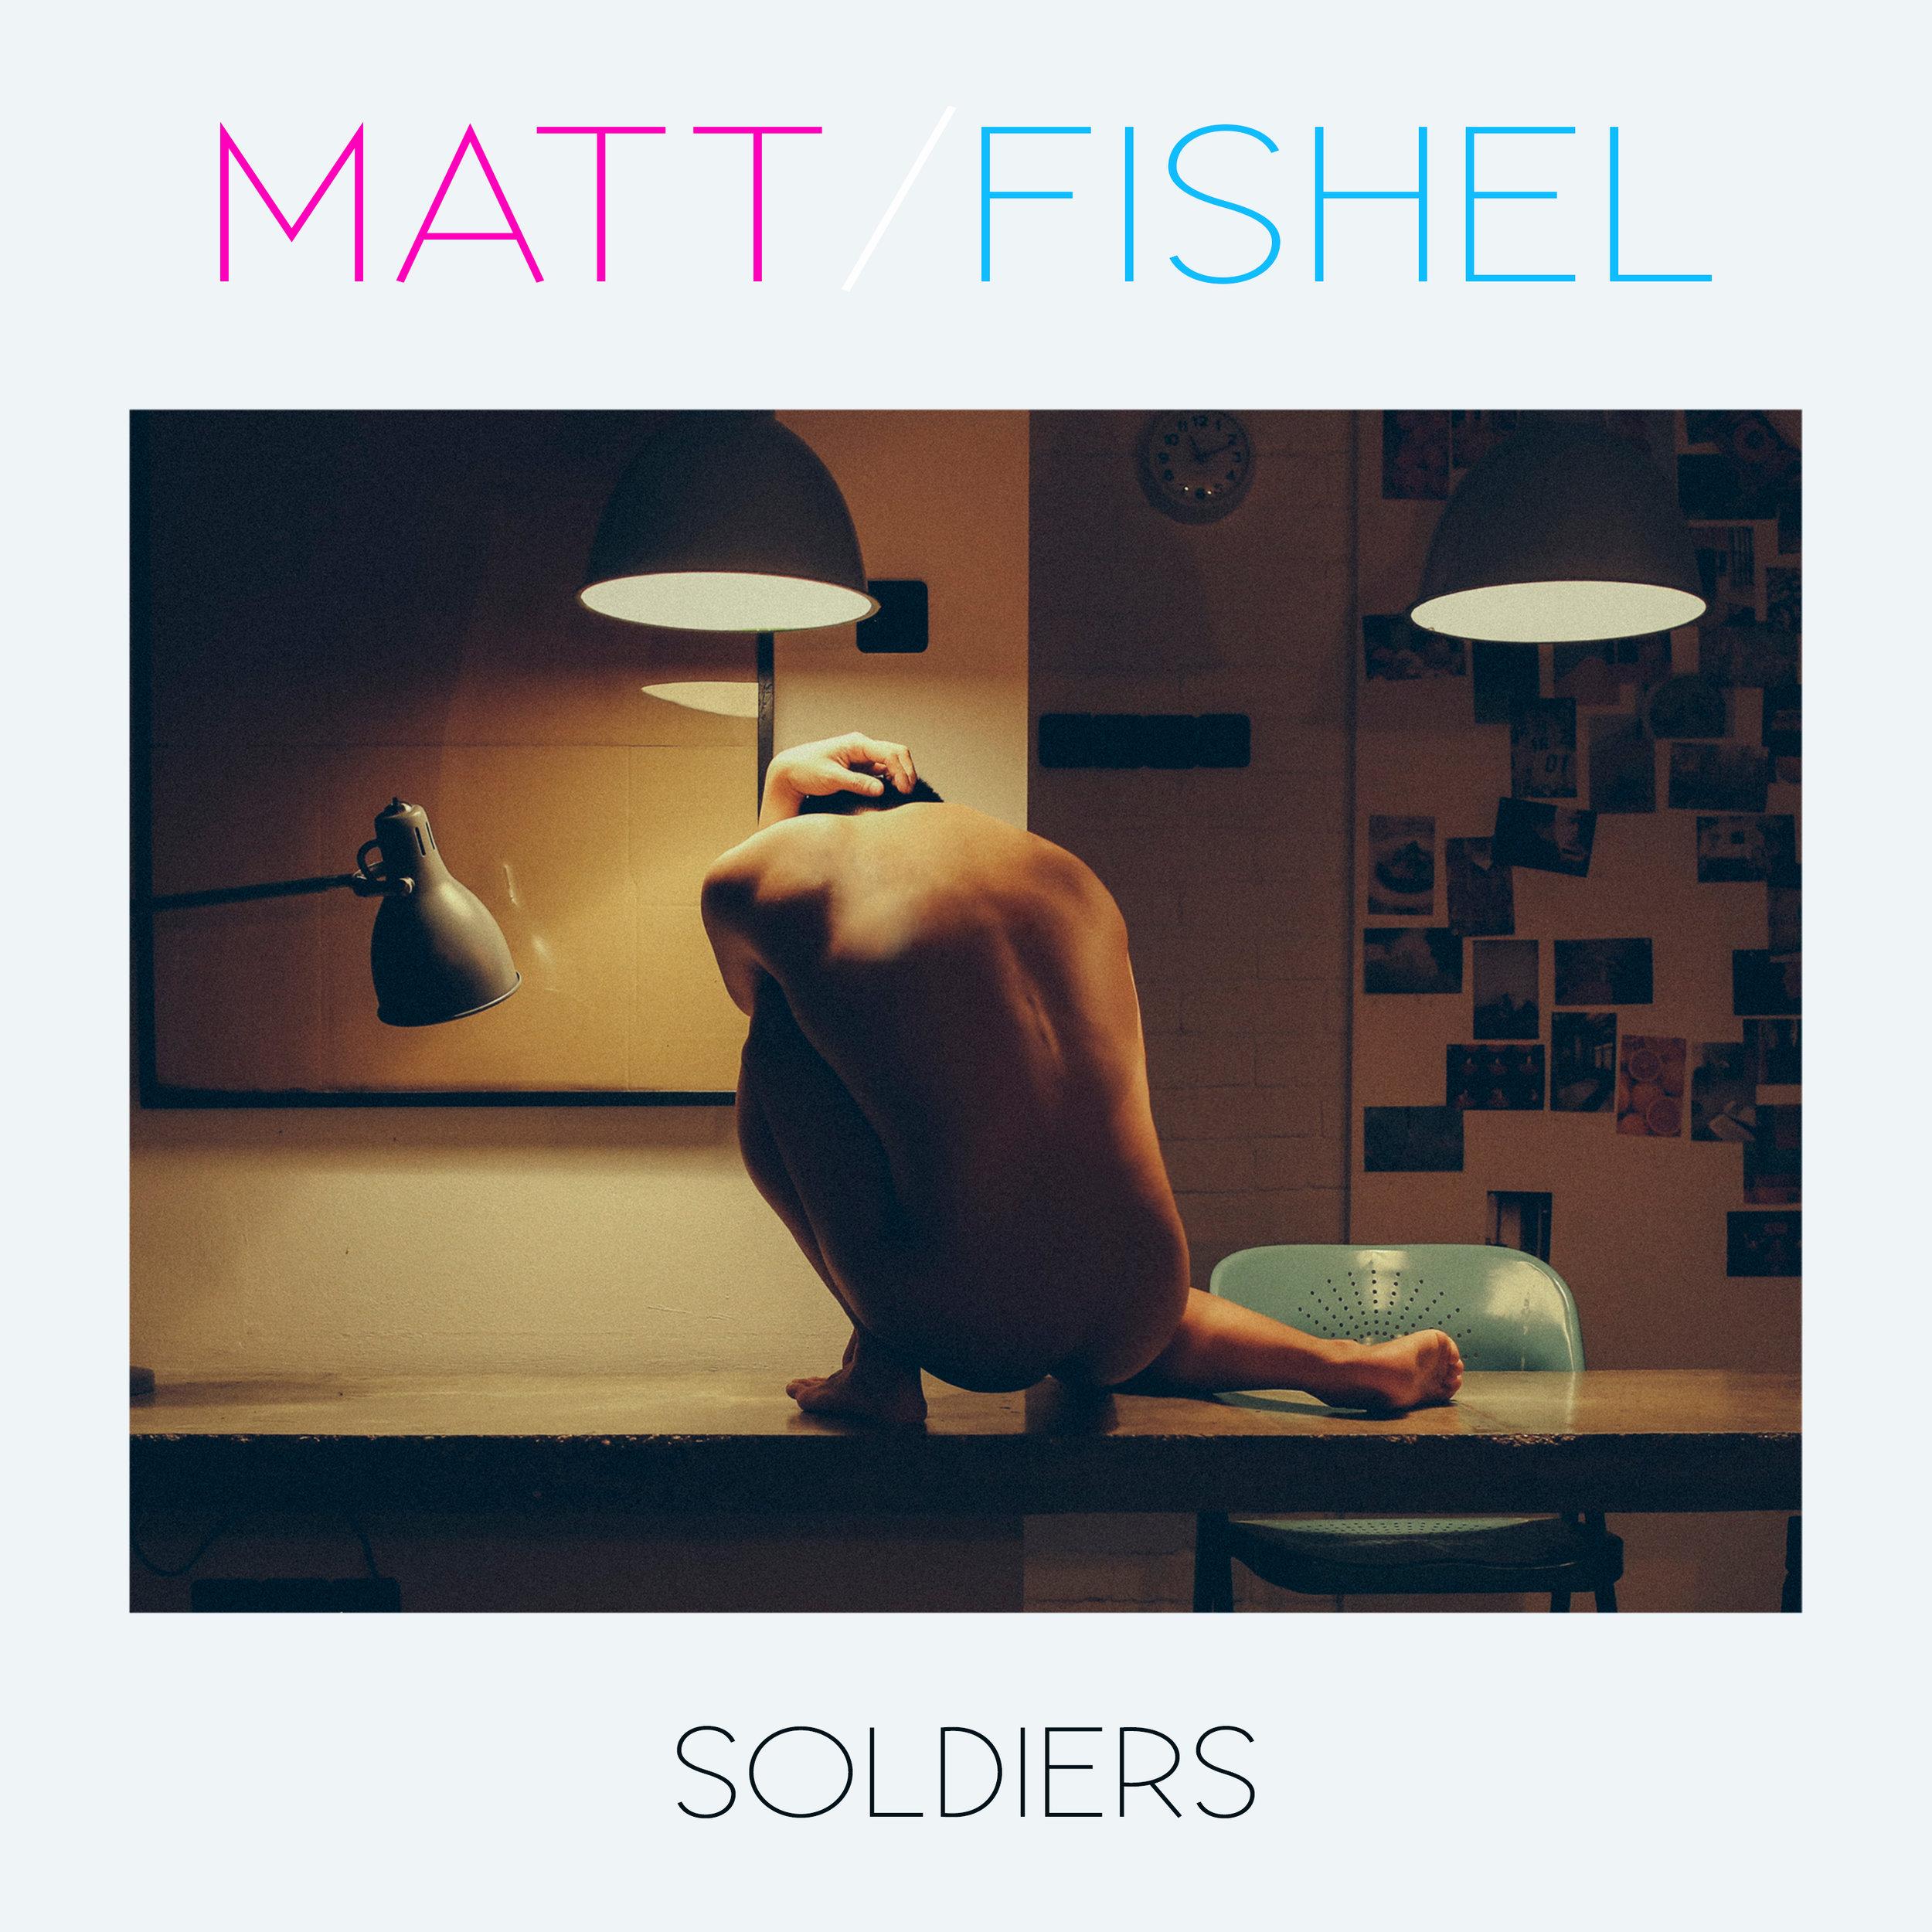 Matt FIshel_Soldiers_Single Cover.jpg